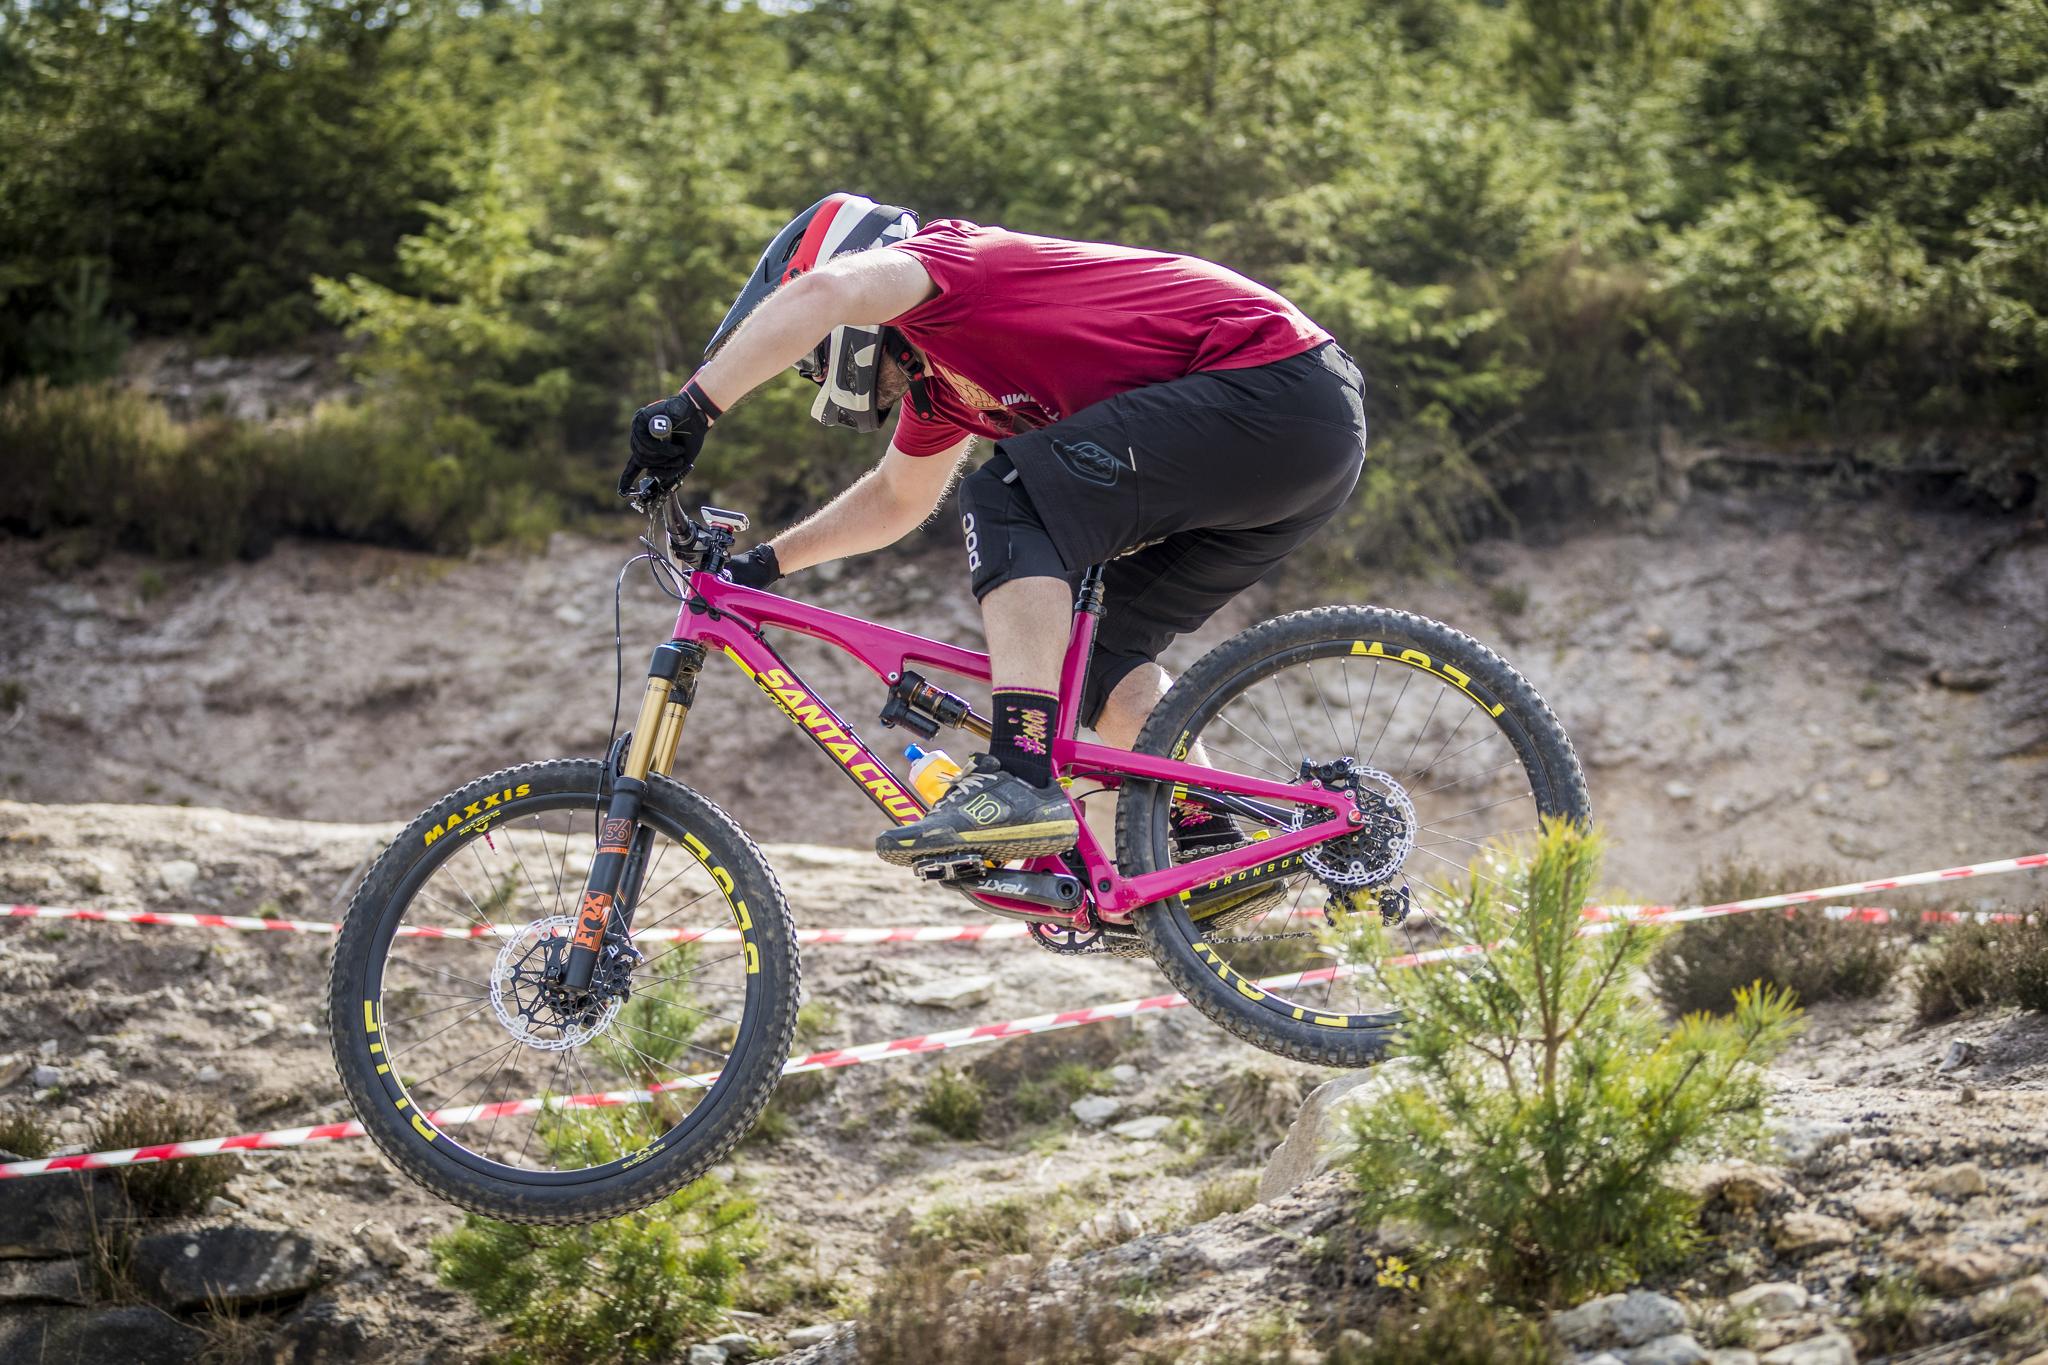 Blue Flow 35mm Carbon Mountain Wheels - Santa Cruz Nomad bike, Blue Flow Wheels, MTB, Wheelsets, Mountain Bike Wheels, Custom built, Free UK Delivery